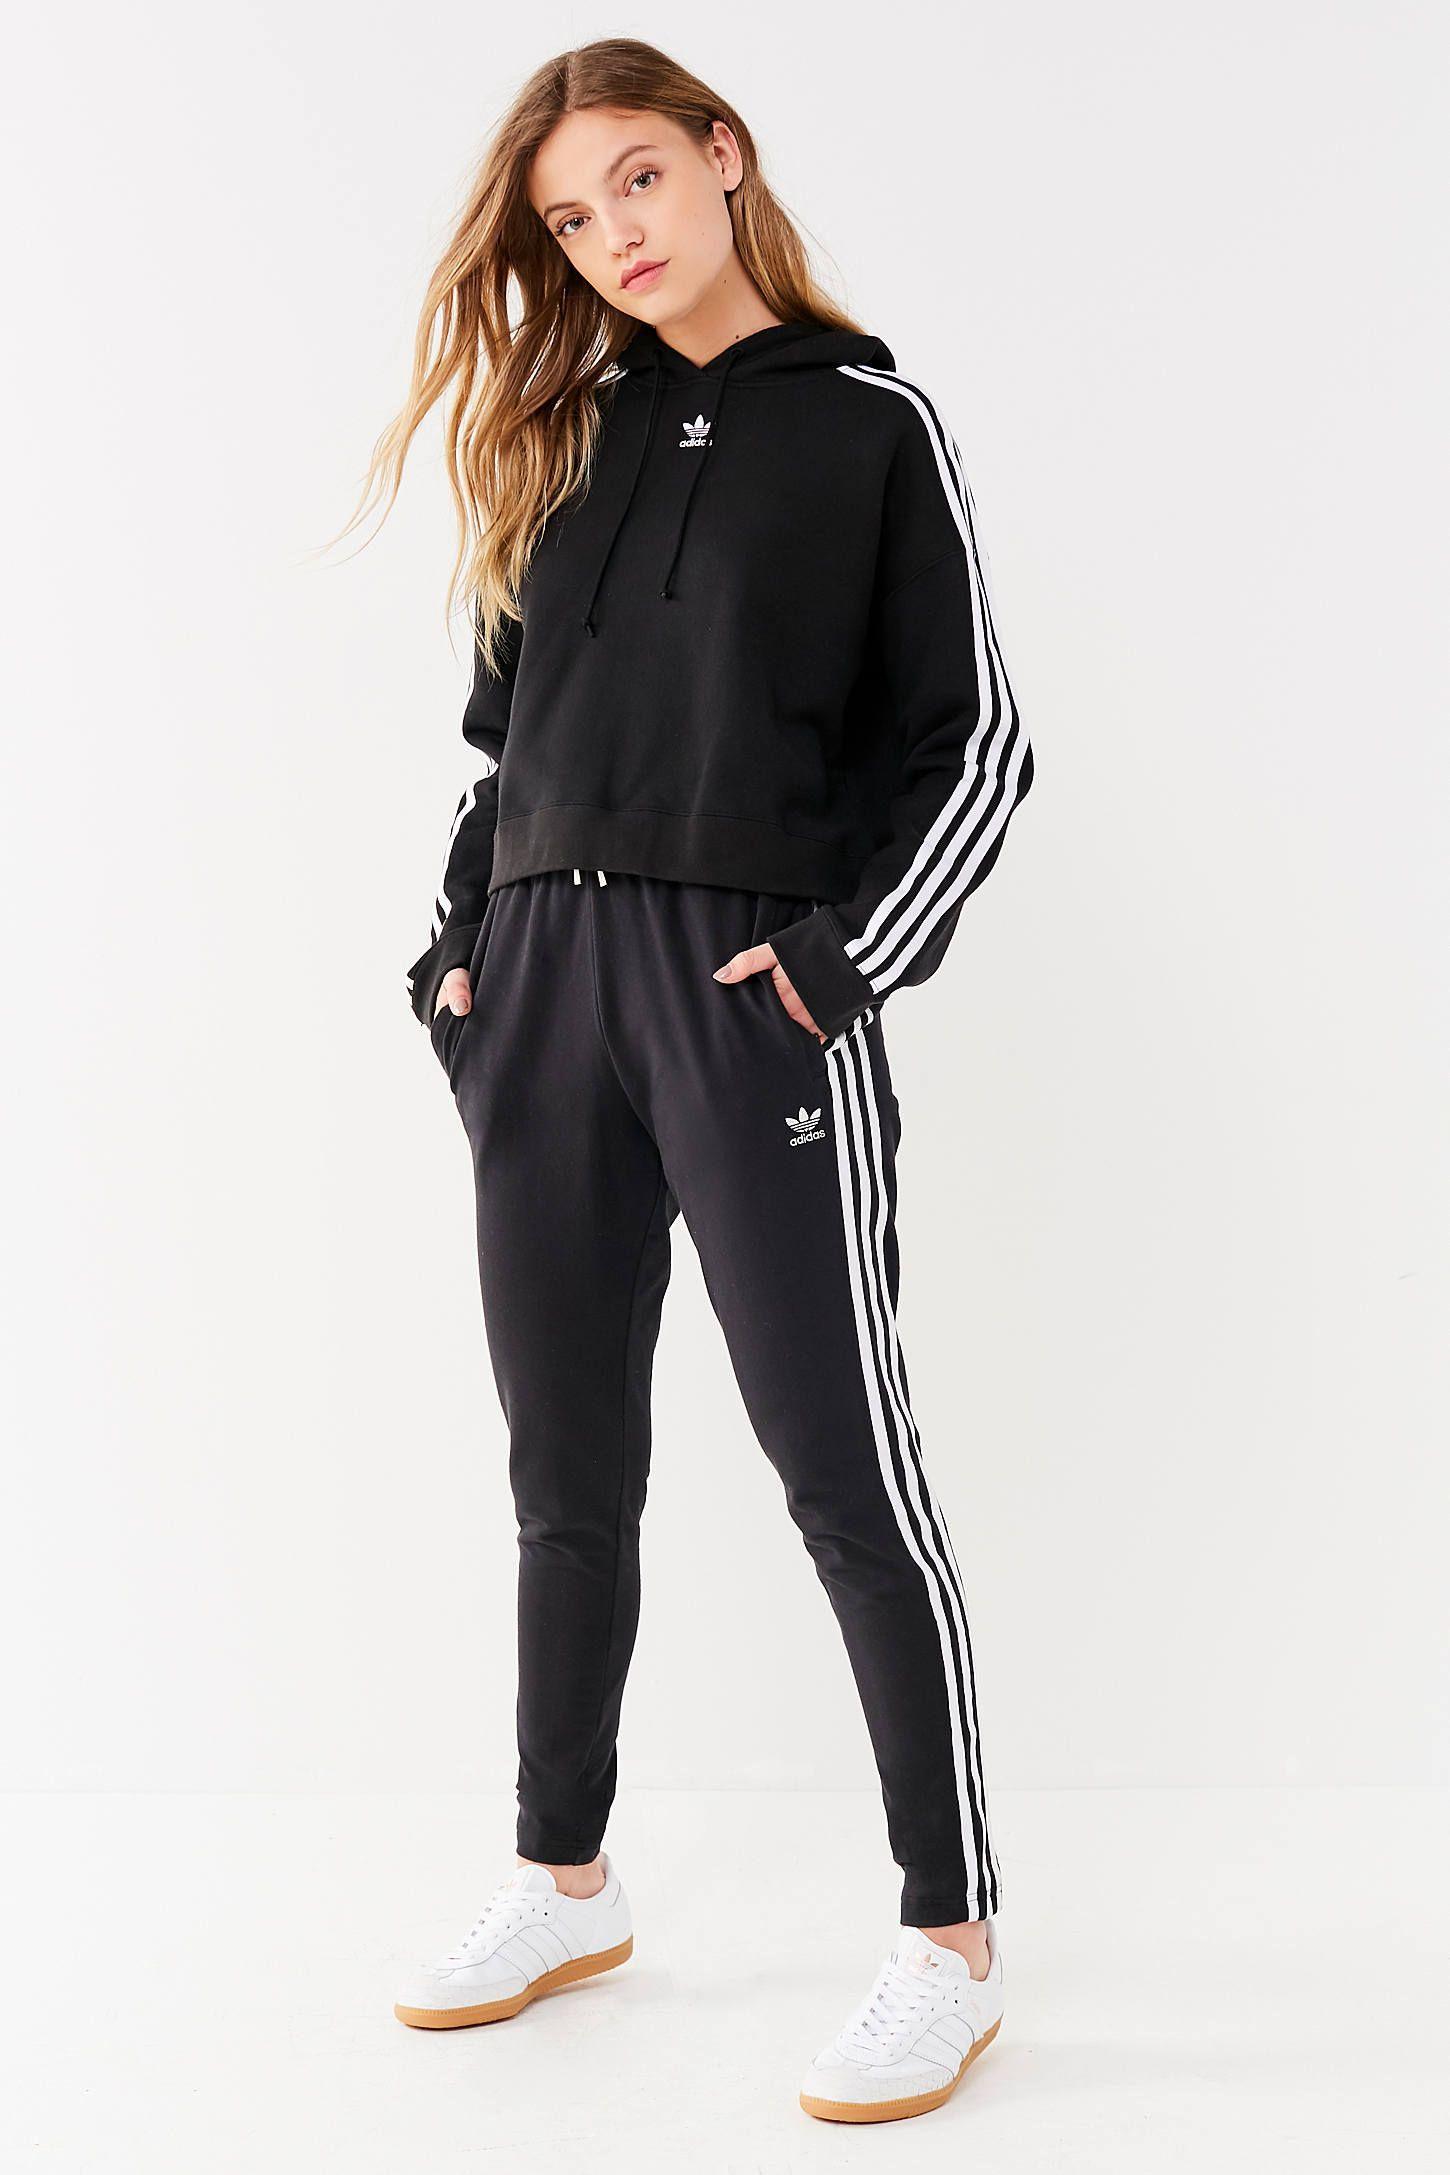 Predownload: Adidas Originals Adicolor 3 Stripes Cropped Hoodie Sweatshirt Adidasclothes Adidas Originals Adicolor 3 Stripes Cropped Hoodie Swe Model Pakaian Pakaian Model [ 2175 x 1450 Pixel ]